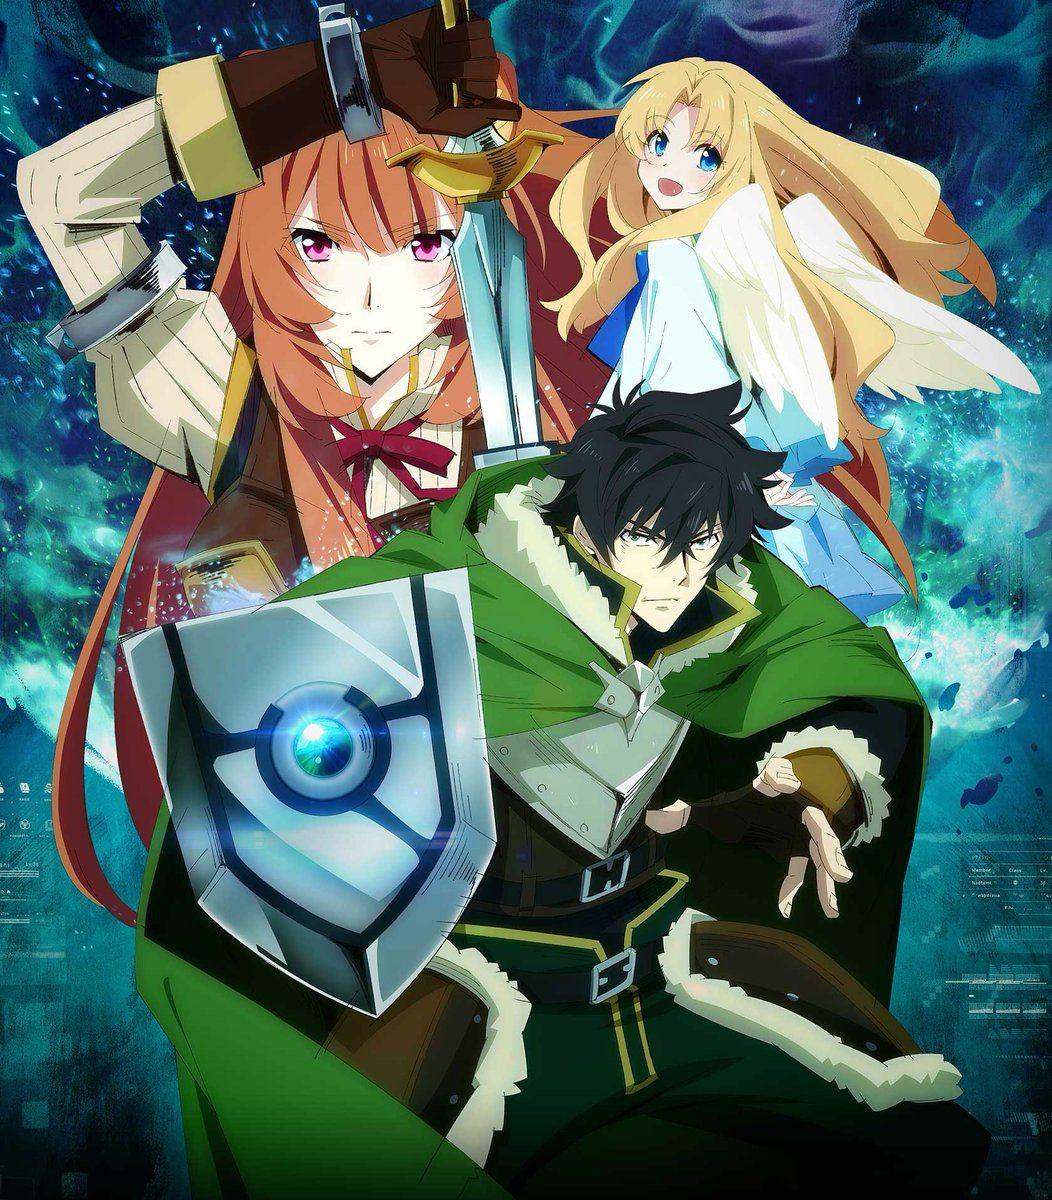 El anime de Tate no Yuusha no Nariagari estrena nuevo tráiler - Ramen Para  Dos